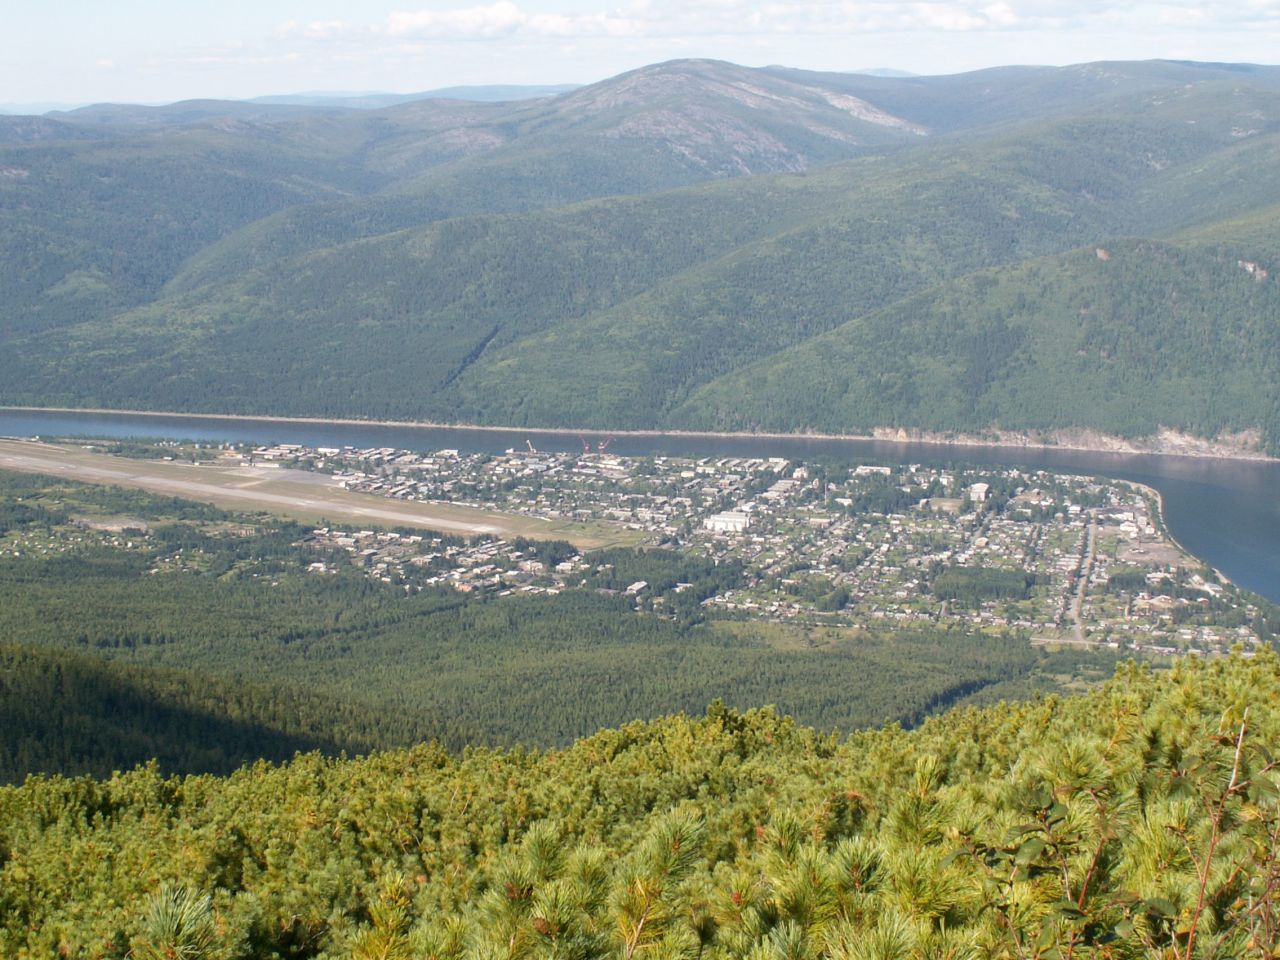 иркутская область поселок мама знакомство